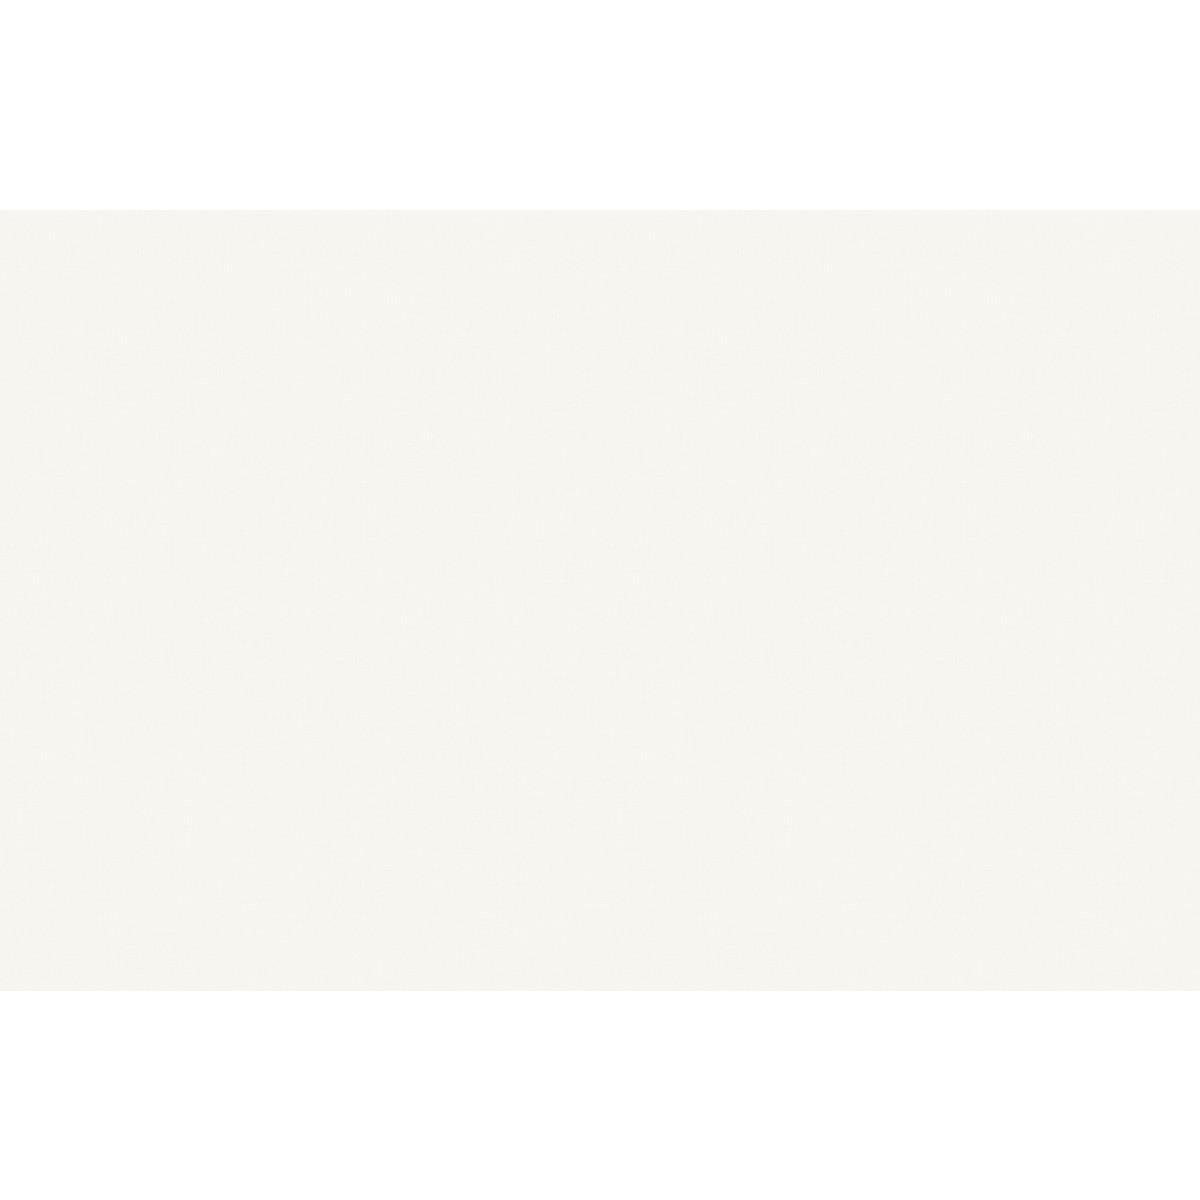 Обои флизелиновые Wallberry Амелия белые 1.06 м 3680